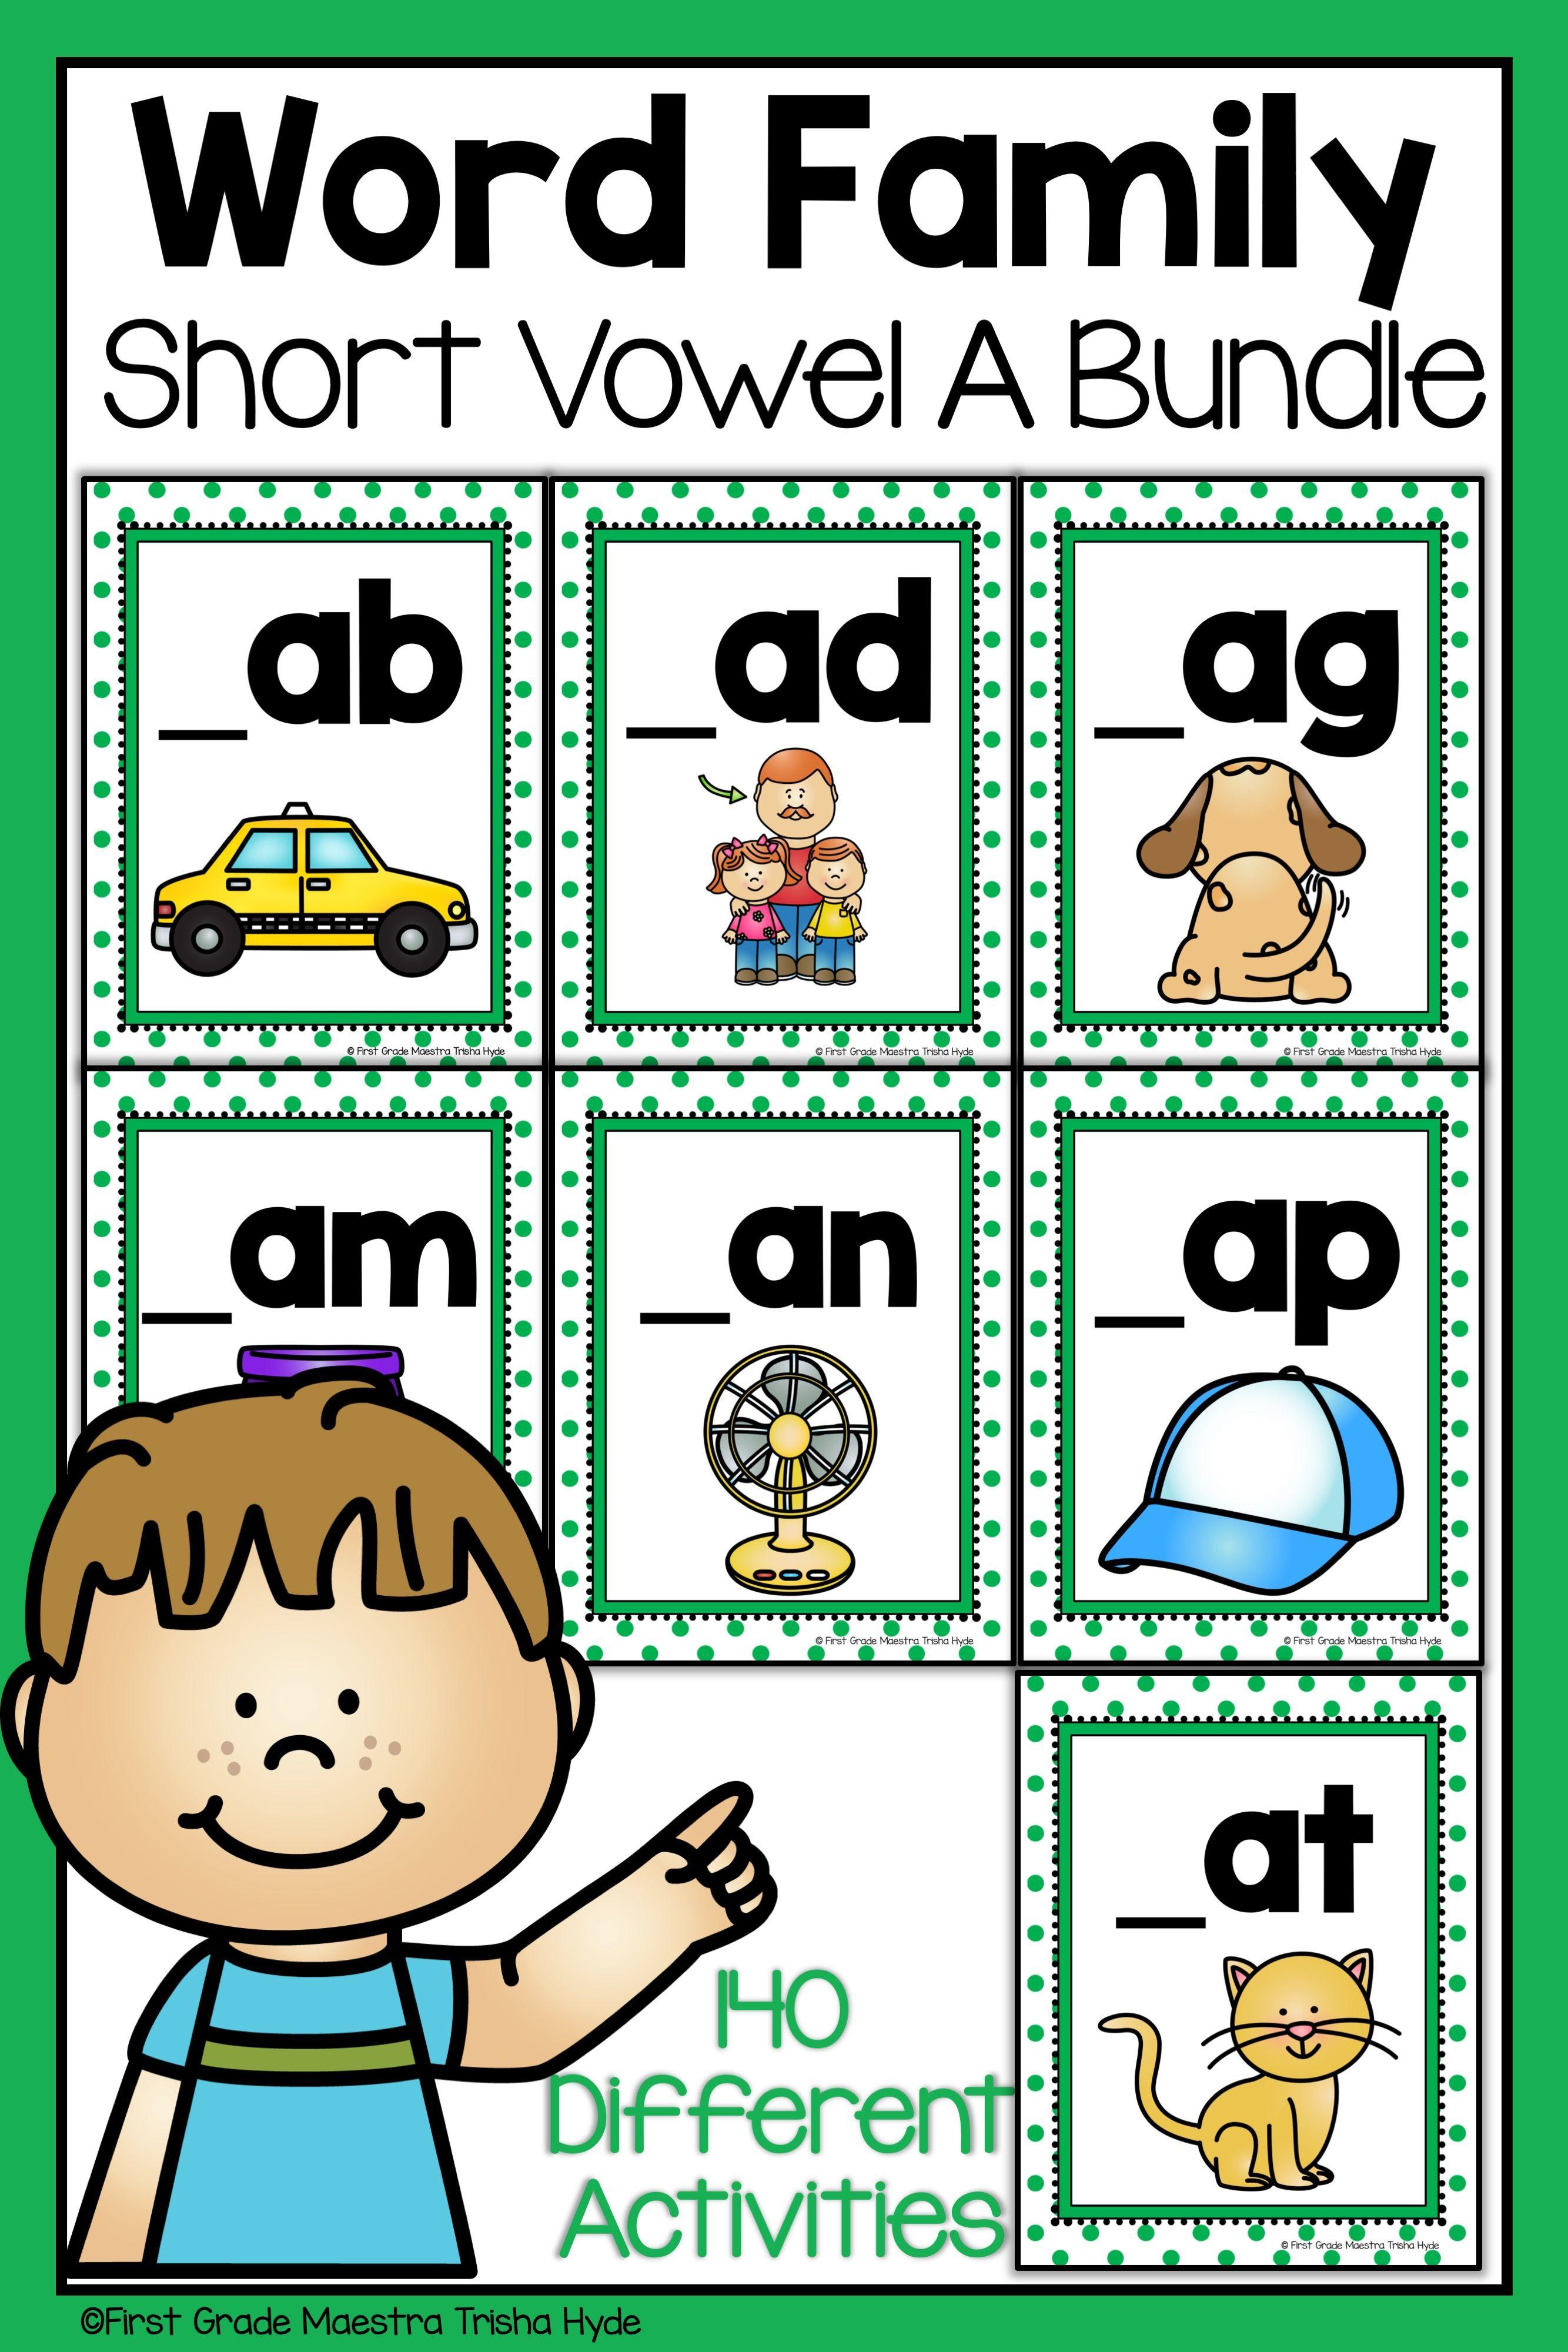 Word Family Short Vowel A Bundle Word Families Word Family Activities Short Vowels